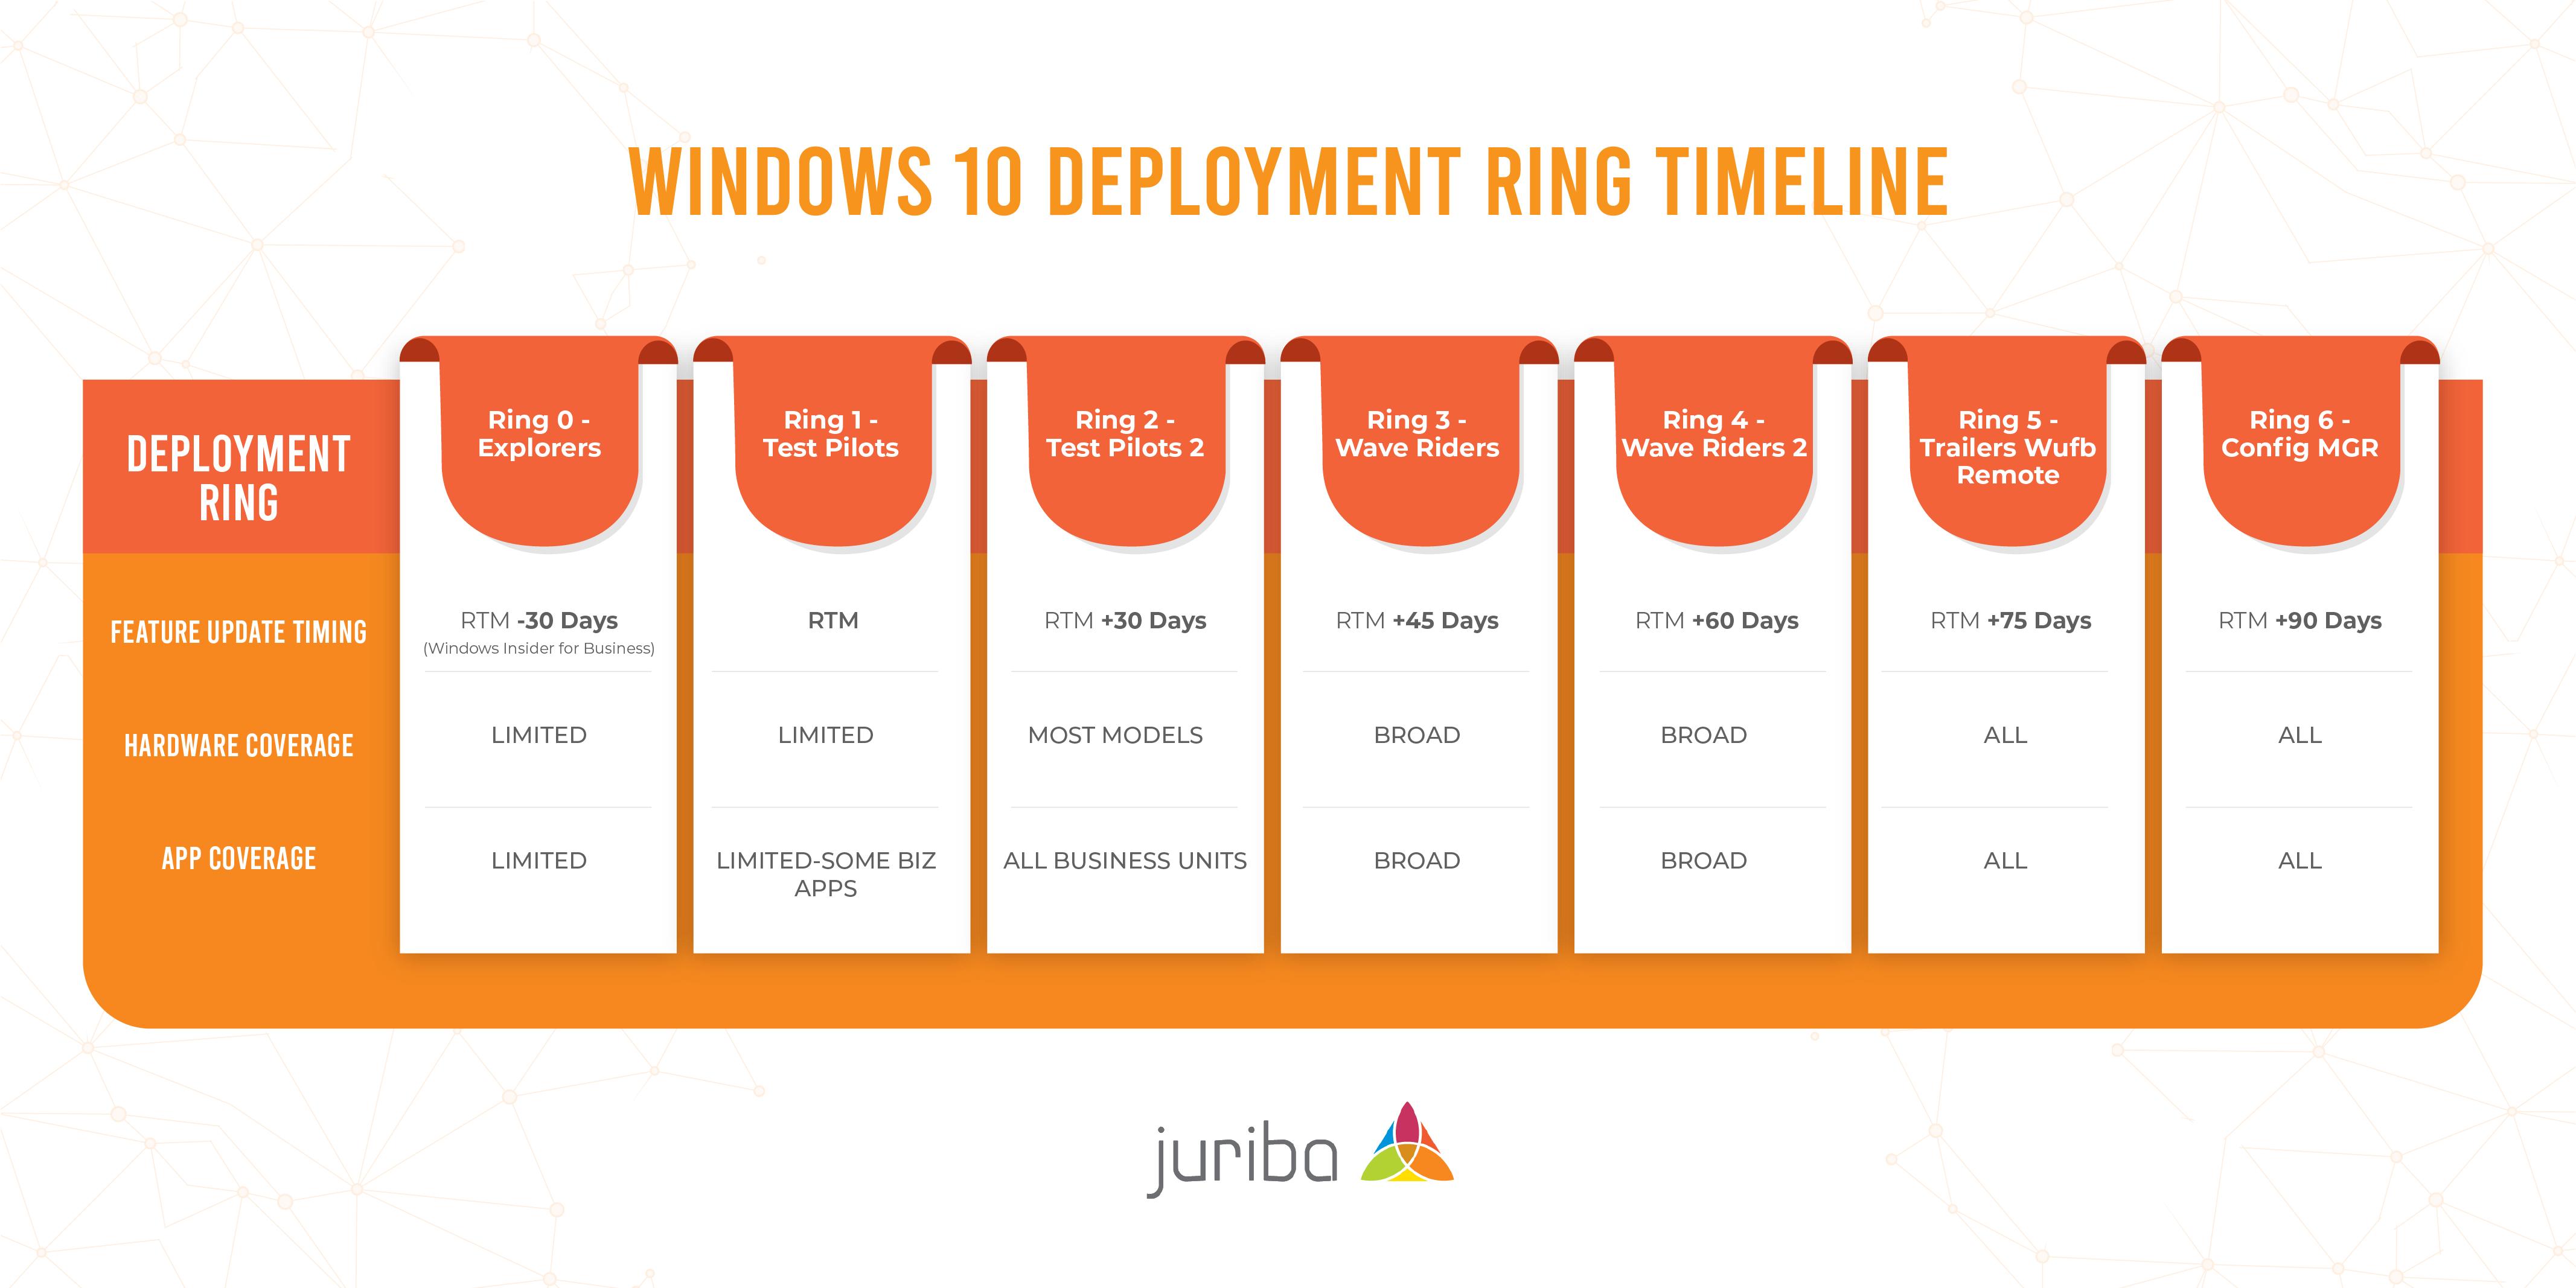 Windows 10 Deployment Ring Timeline-02-01